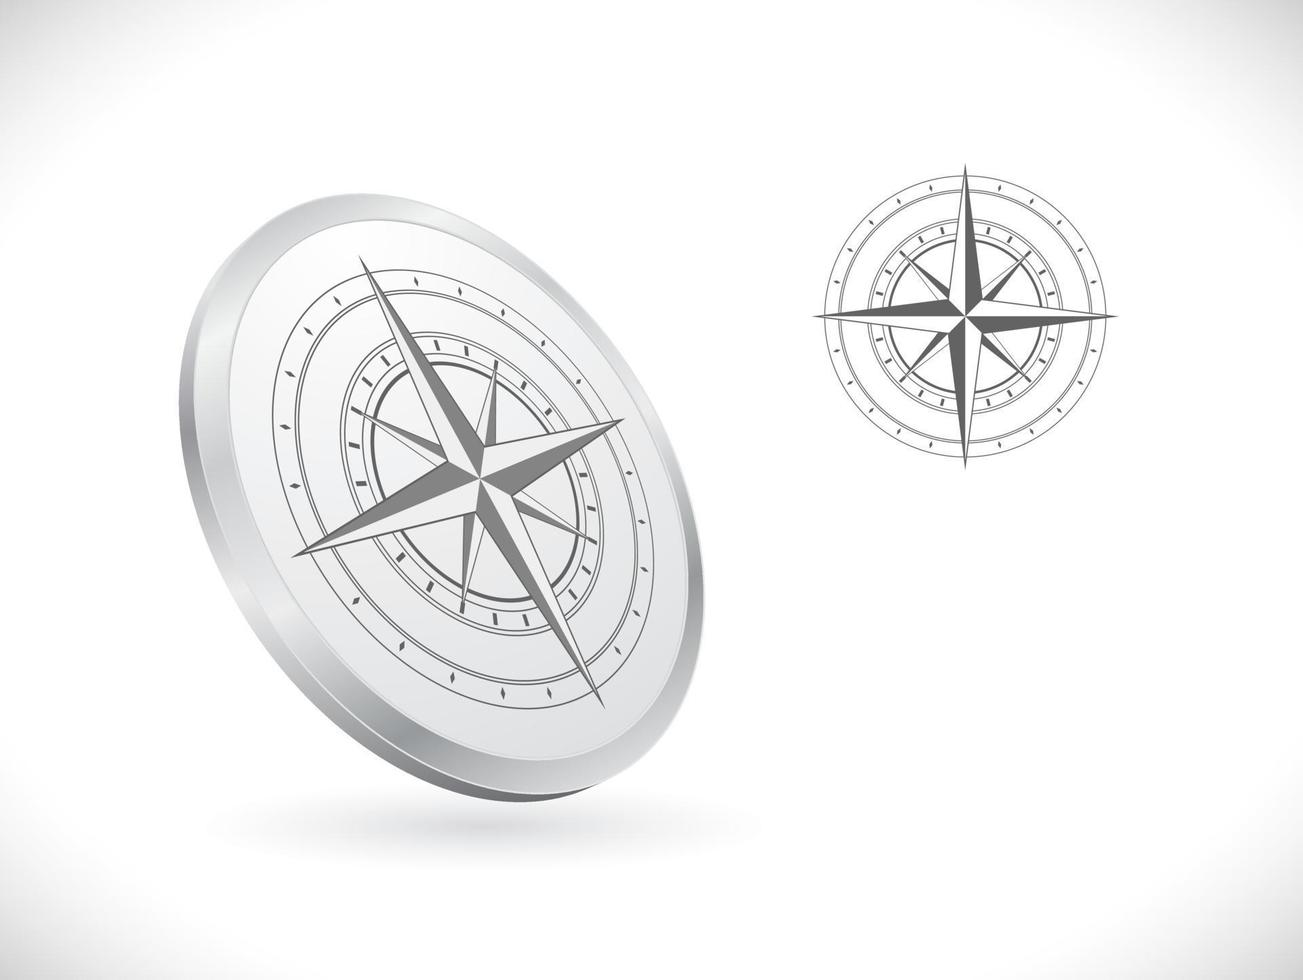 Kompass 3d Vektor